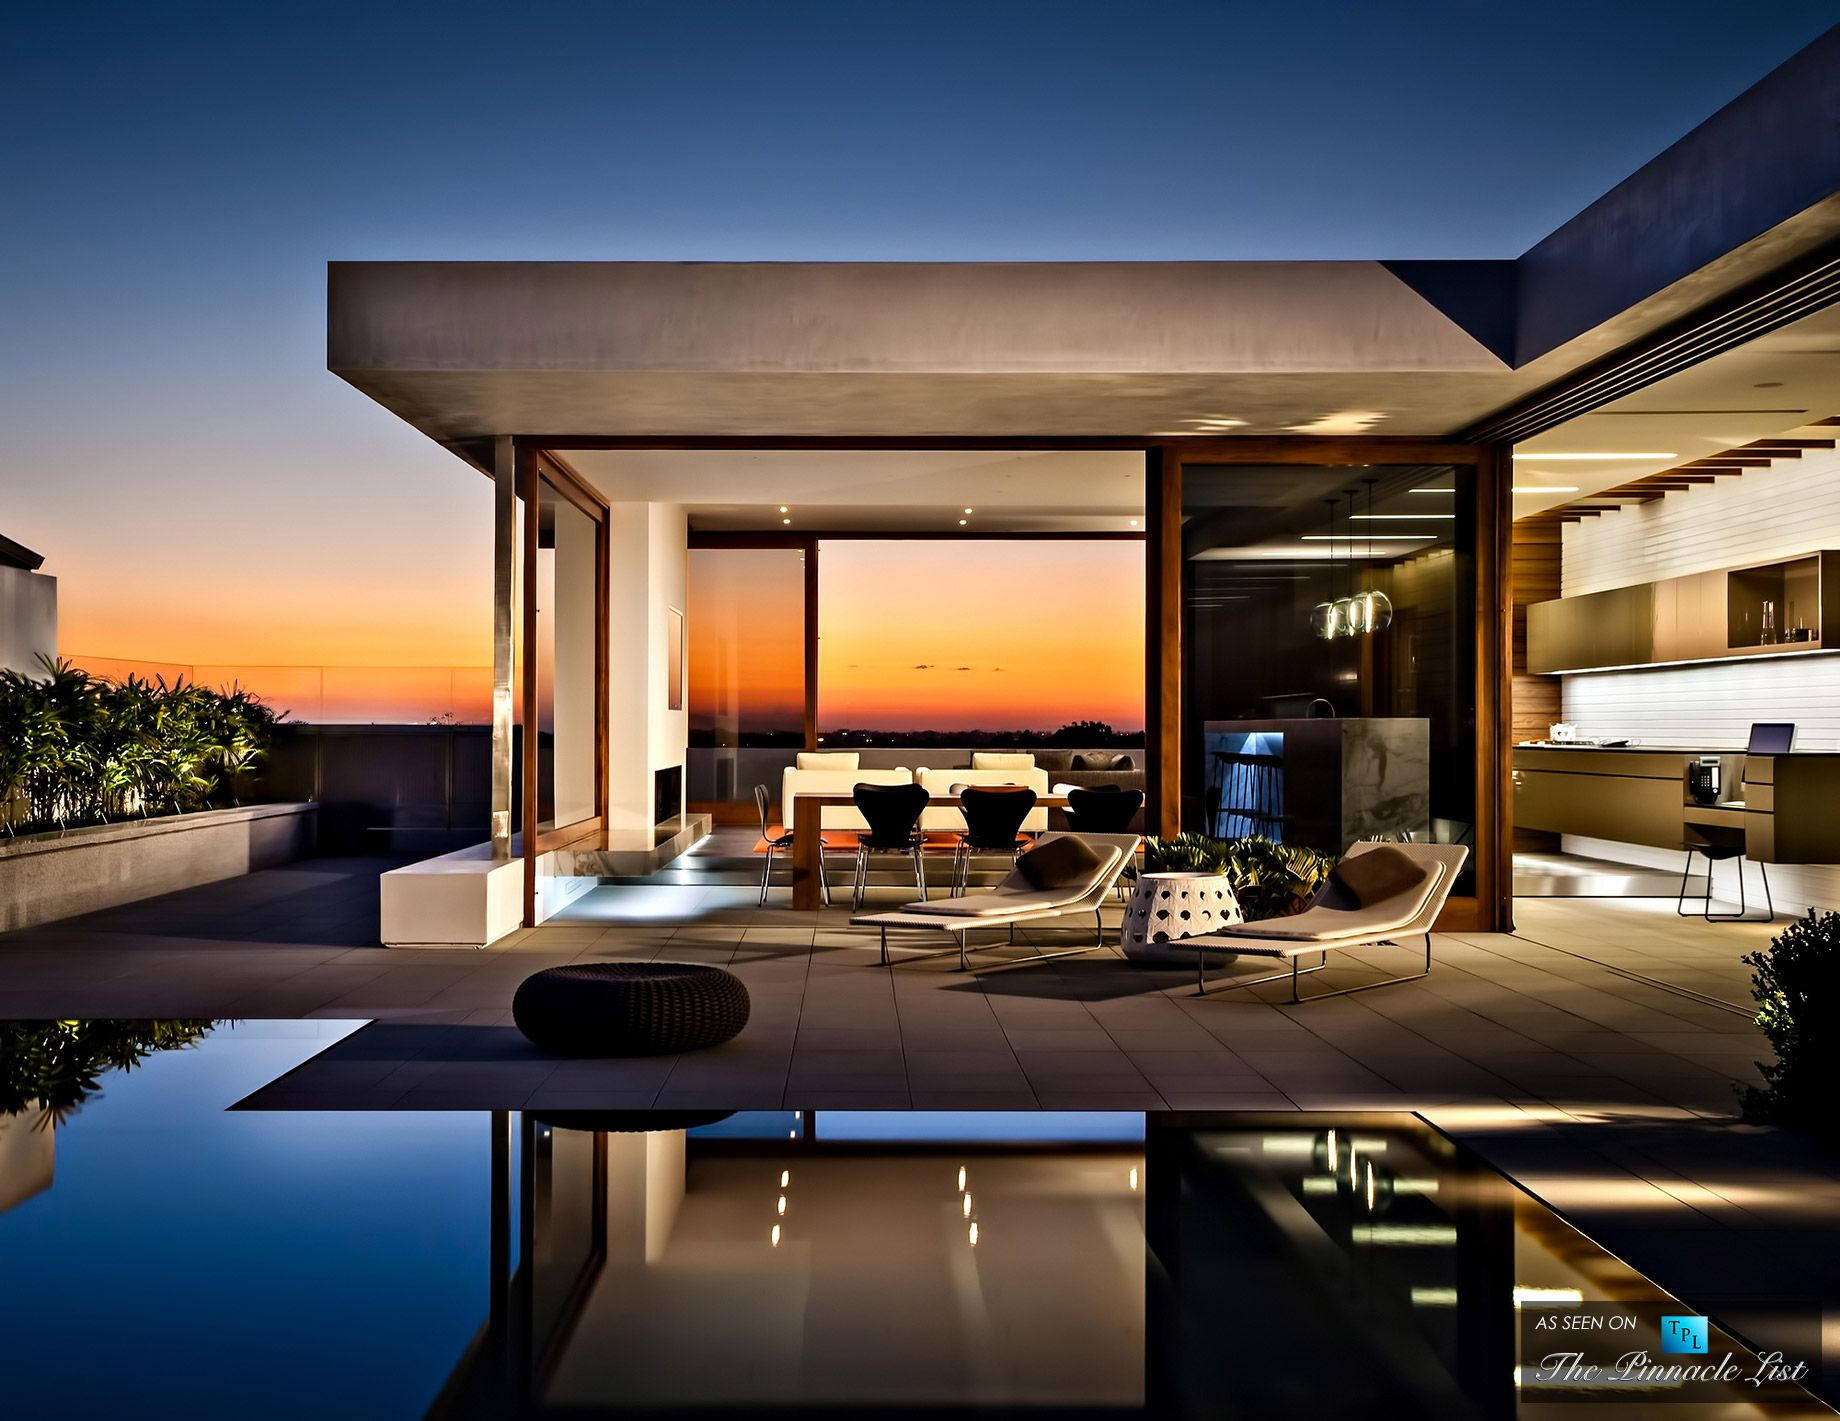 Cormac residence newport beach ca arquitectura for Casa minimalista harbor view hills arquitecto laidlaw schultz california